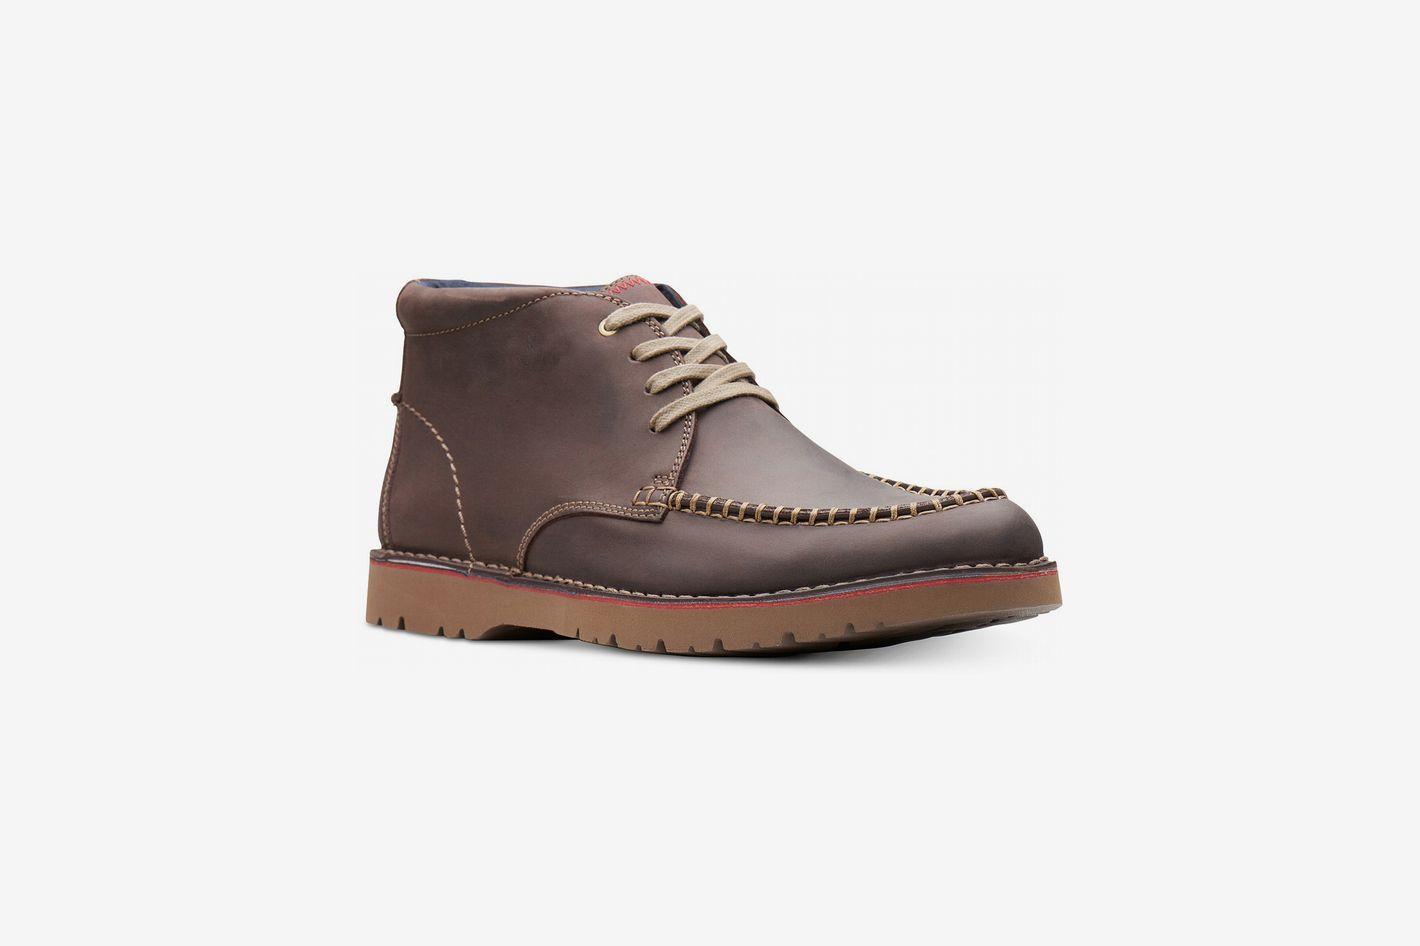 Clarks Men's Vargo Apron-Toe Leather Chukka Boots, Created for Macy's